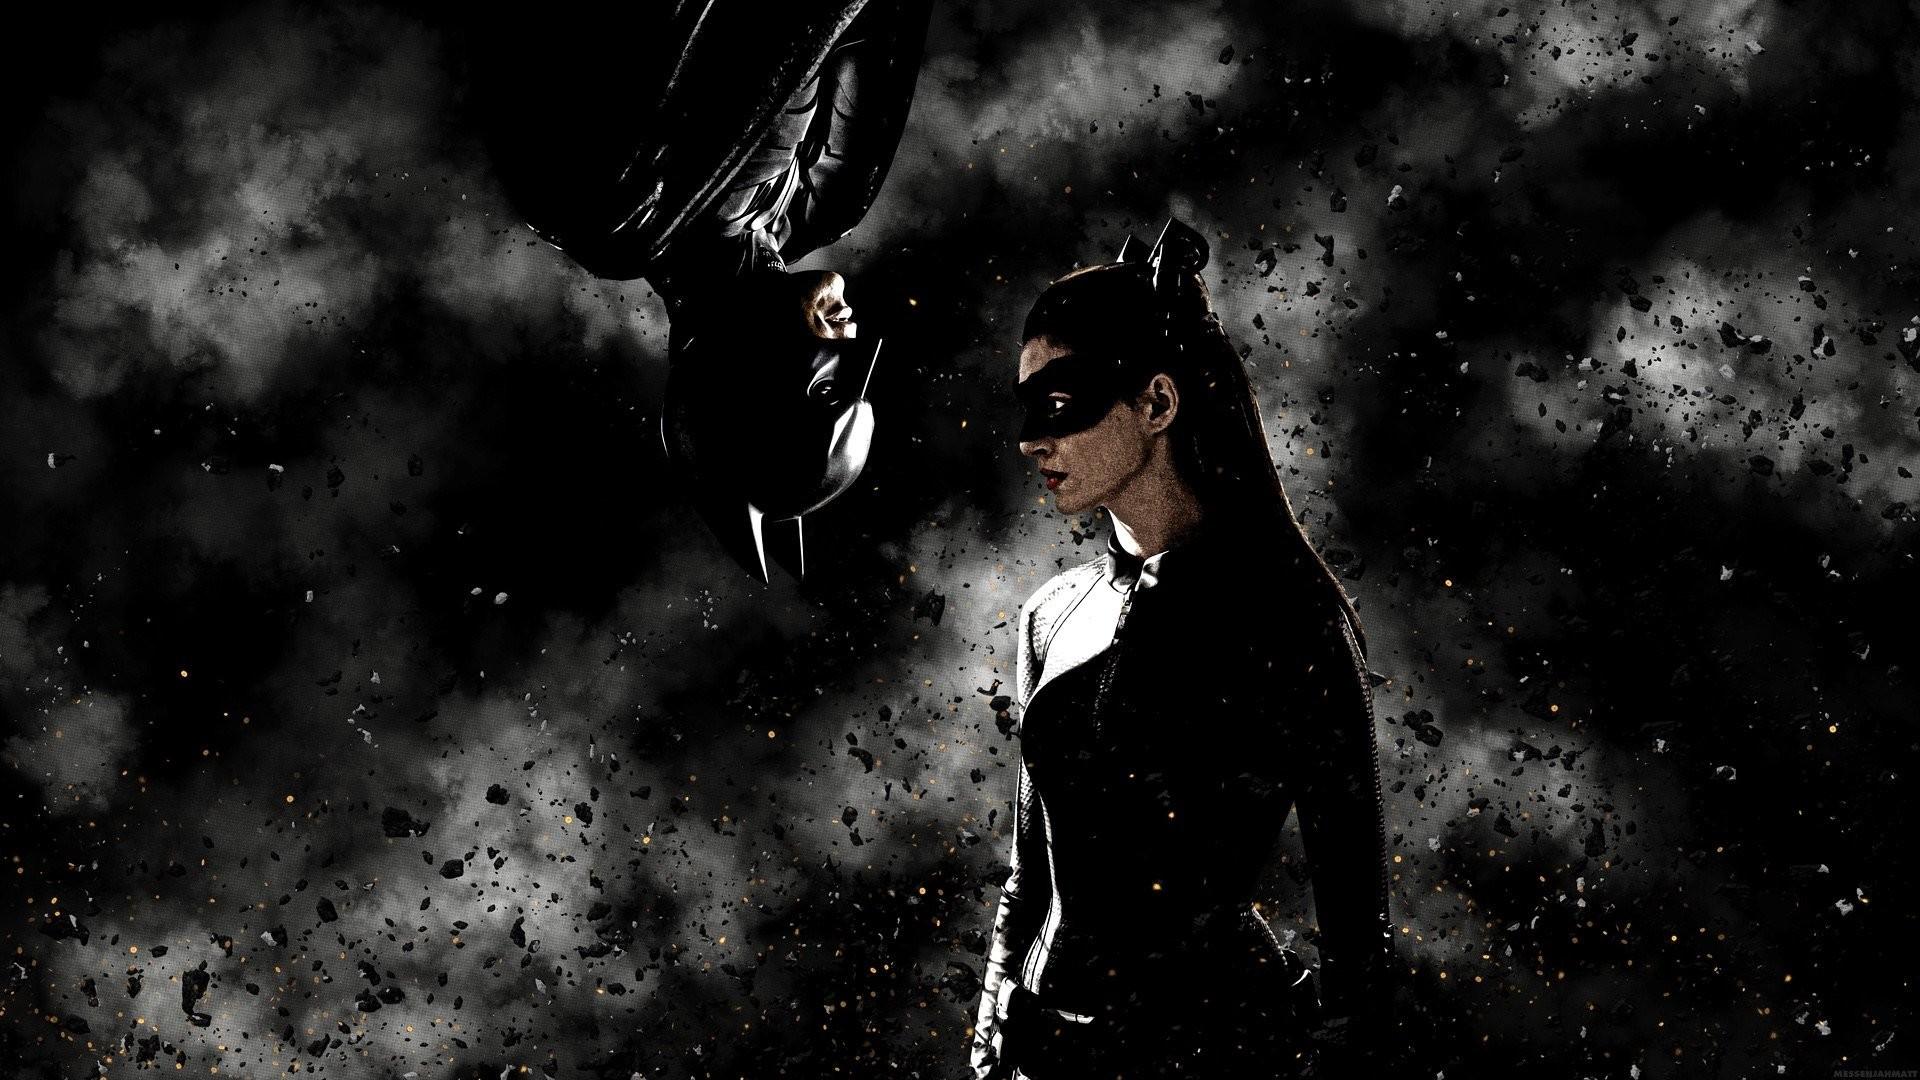 Best 25+ Dark knight wallpaper ideas on Pinterest | Batman comic wallpaper,  Batman and Batman art